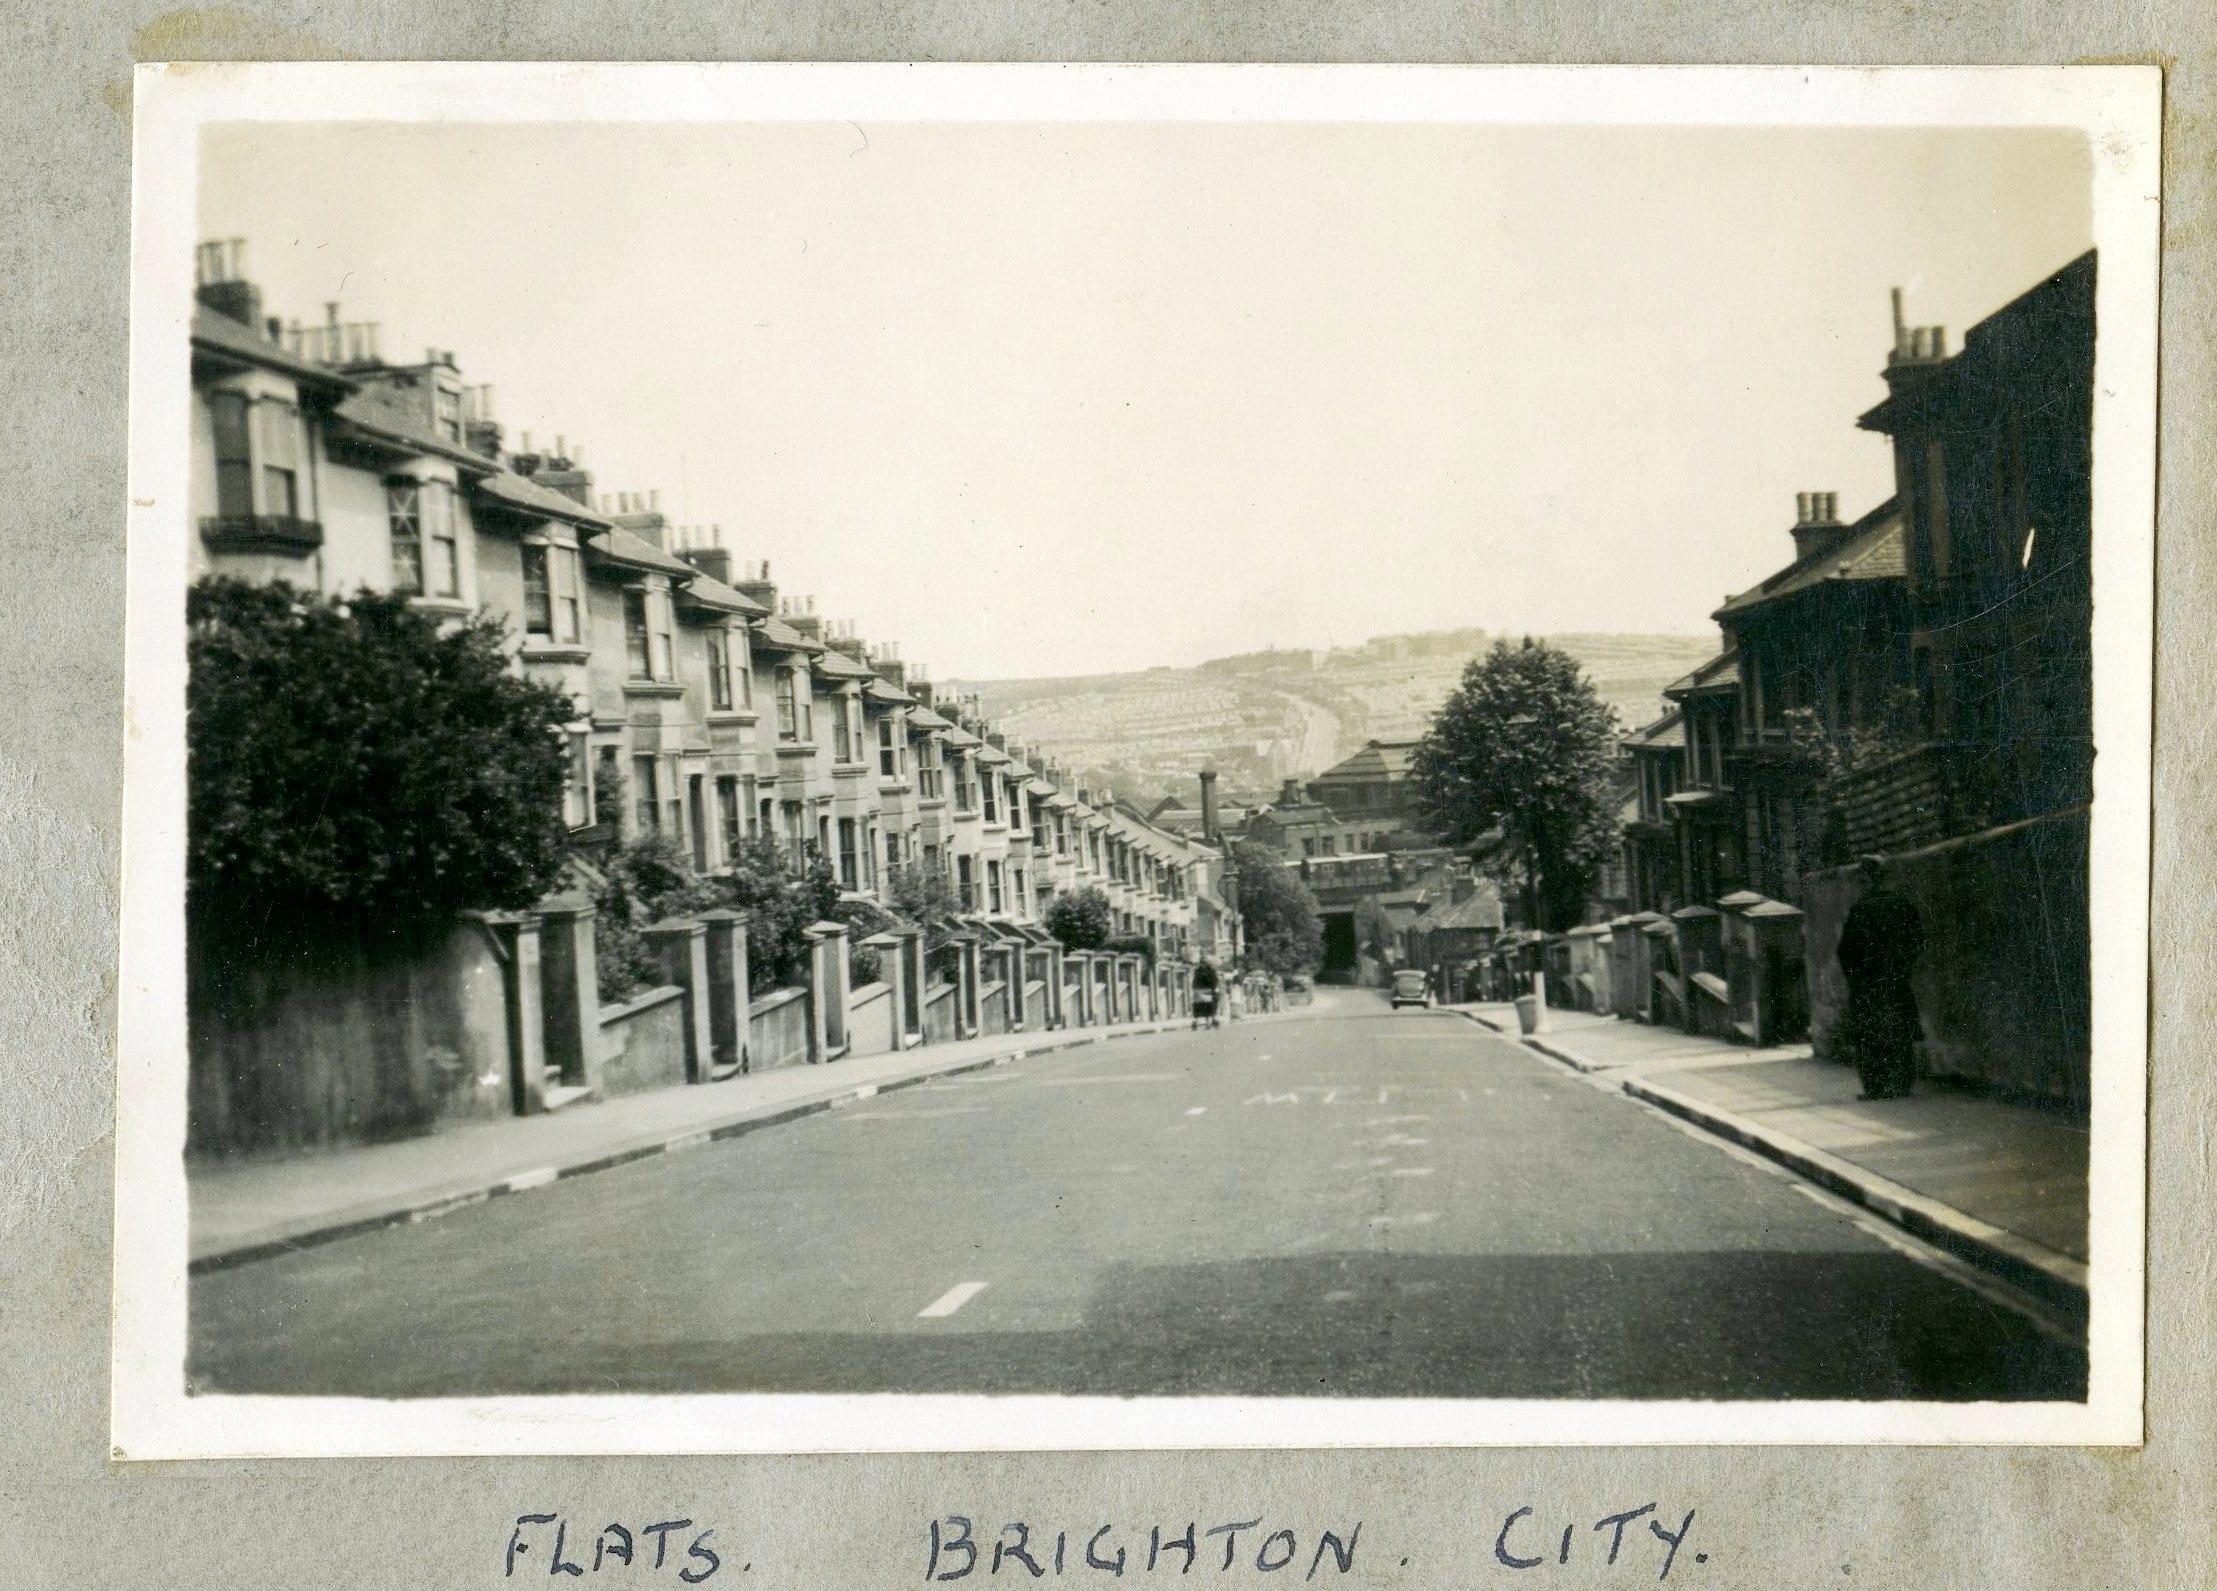 Flats Brighton City